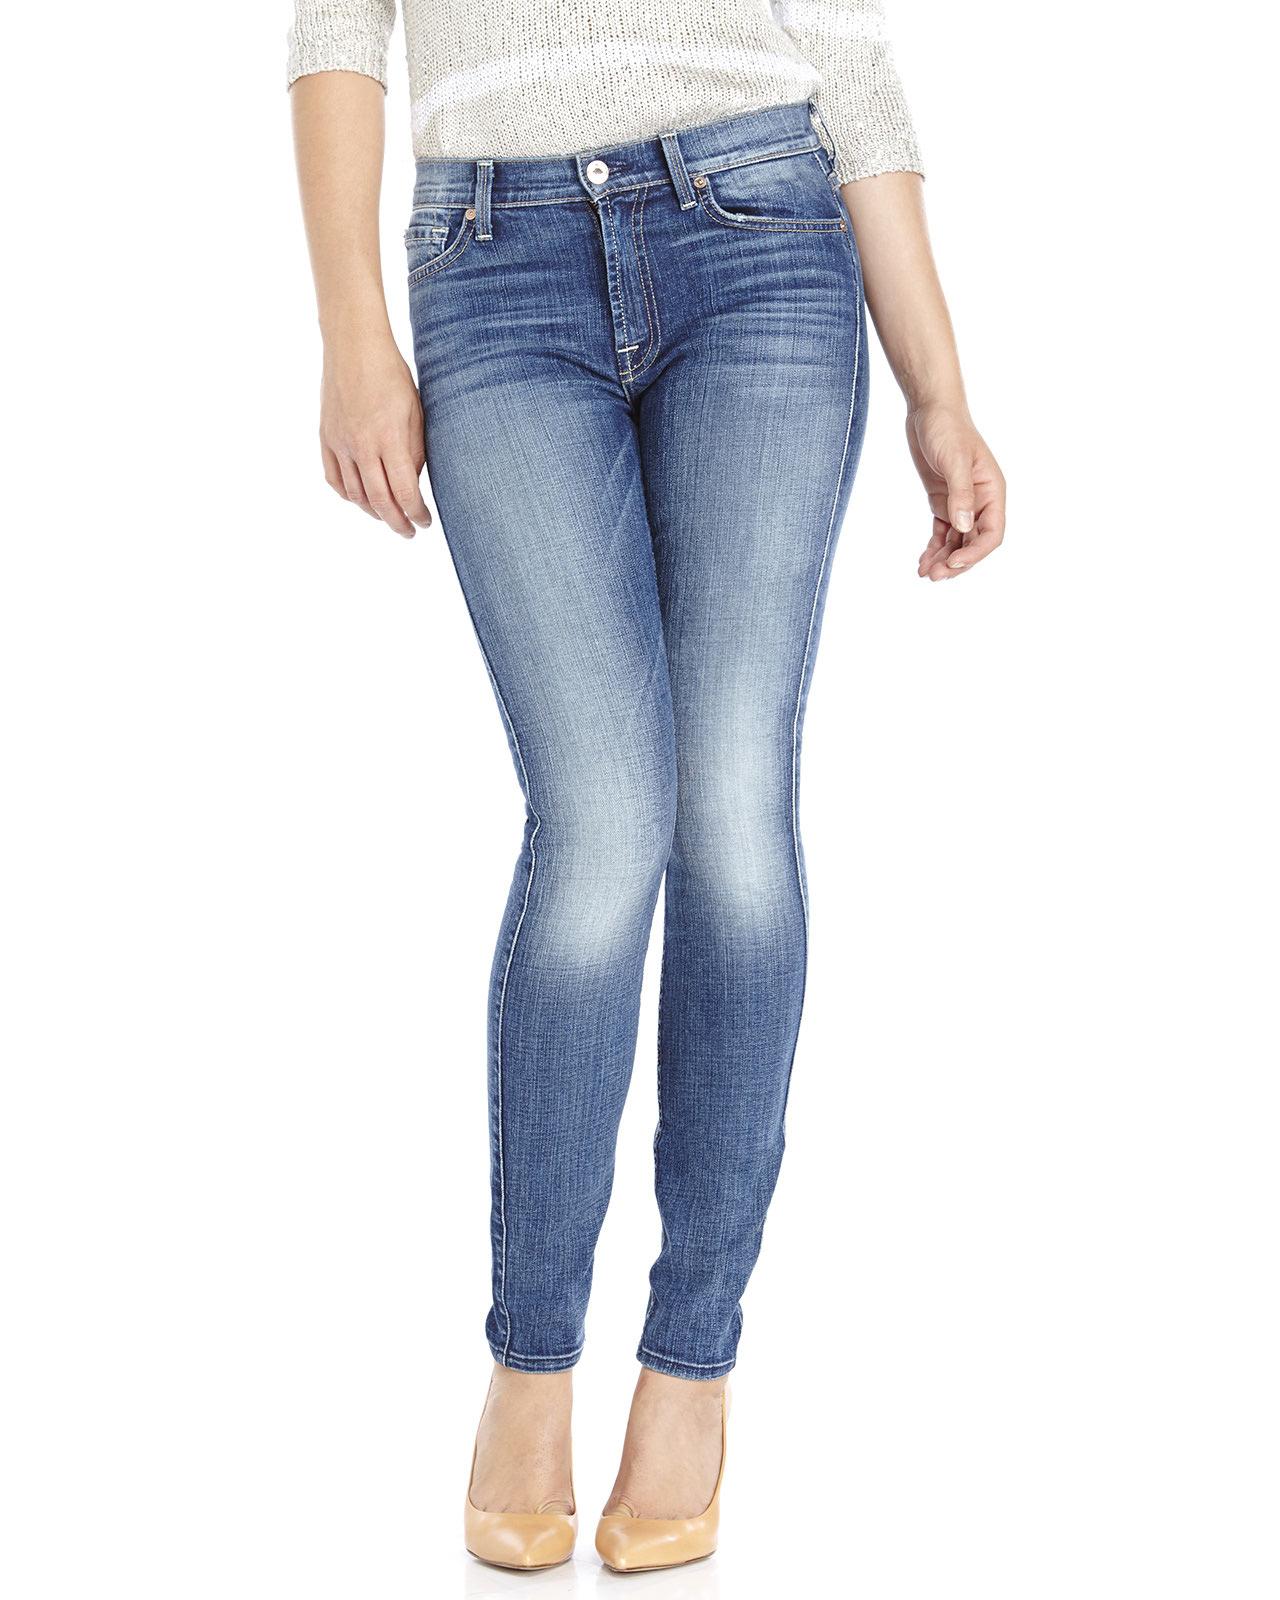 for all mankind blue slim illusion high waist skinny jeans lyst. Black Bedroom Furniture Sets. Home Design Ideas